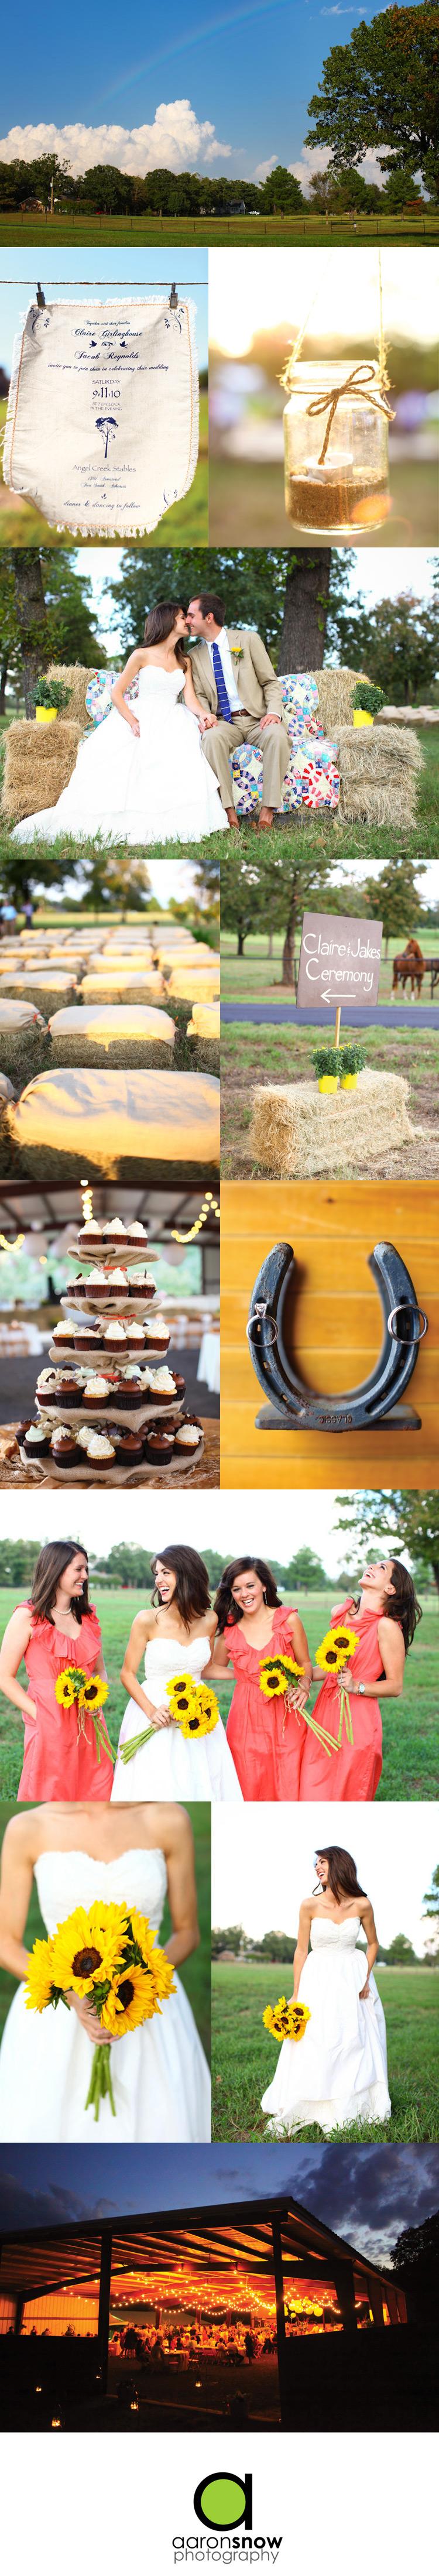 Oklahoma wedding photography Aaron Snow Photography